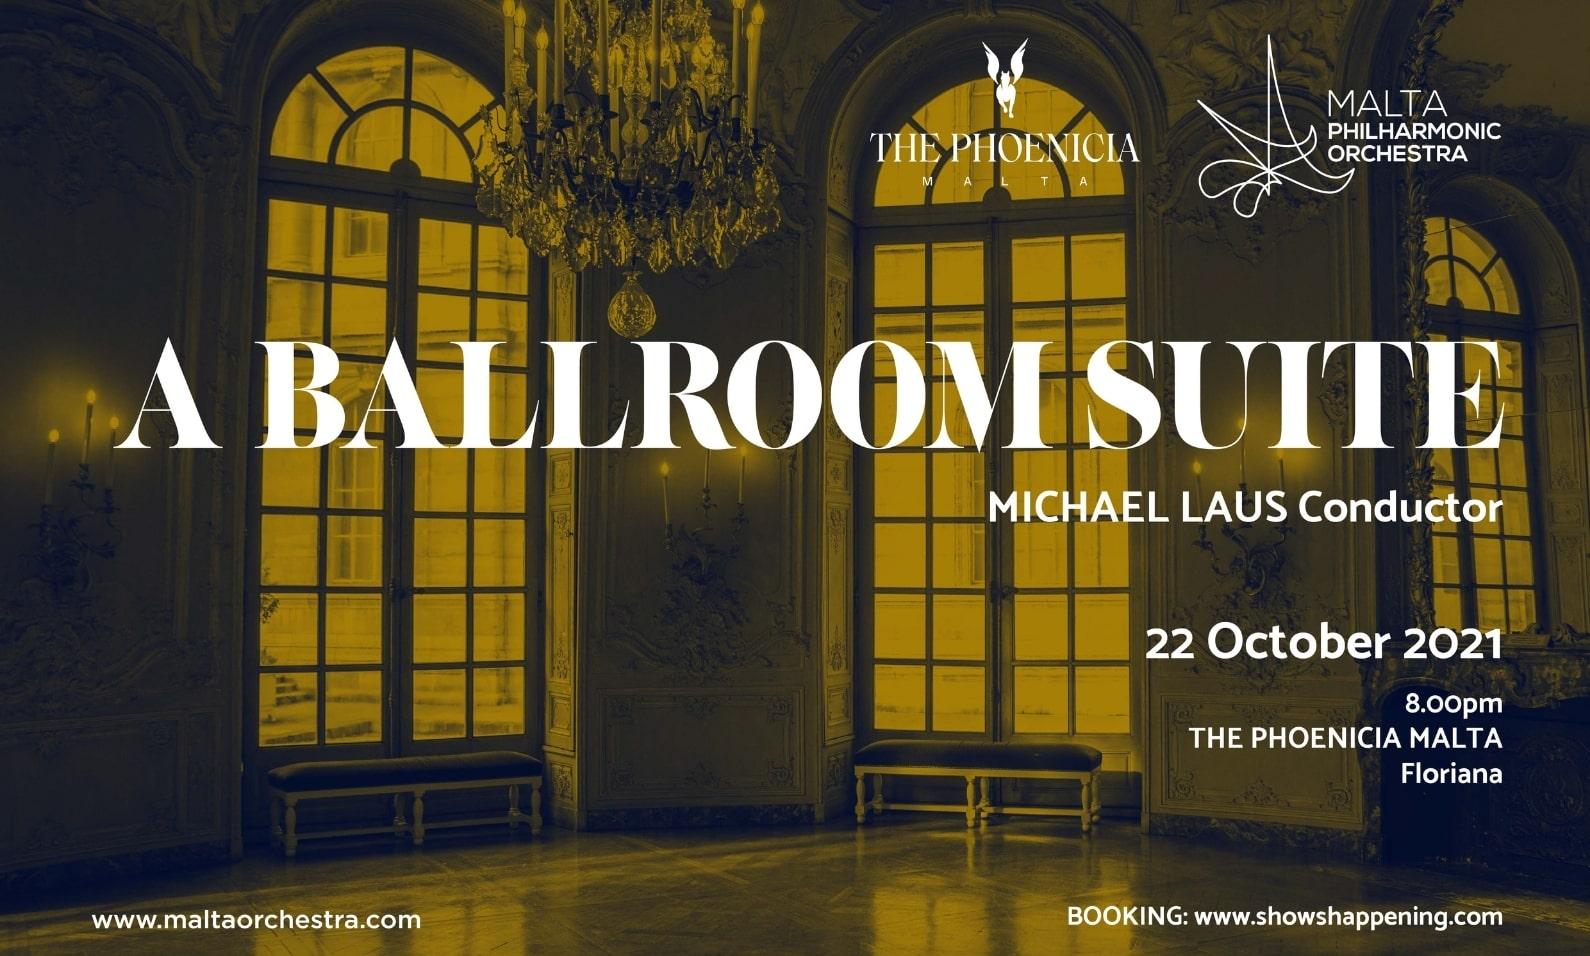 A Ballroom Suite - Malta Philharmonic Orchestra